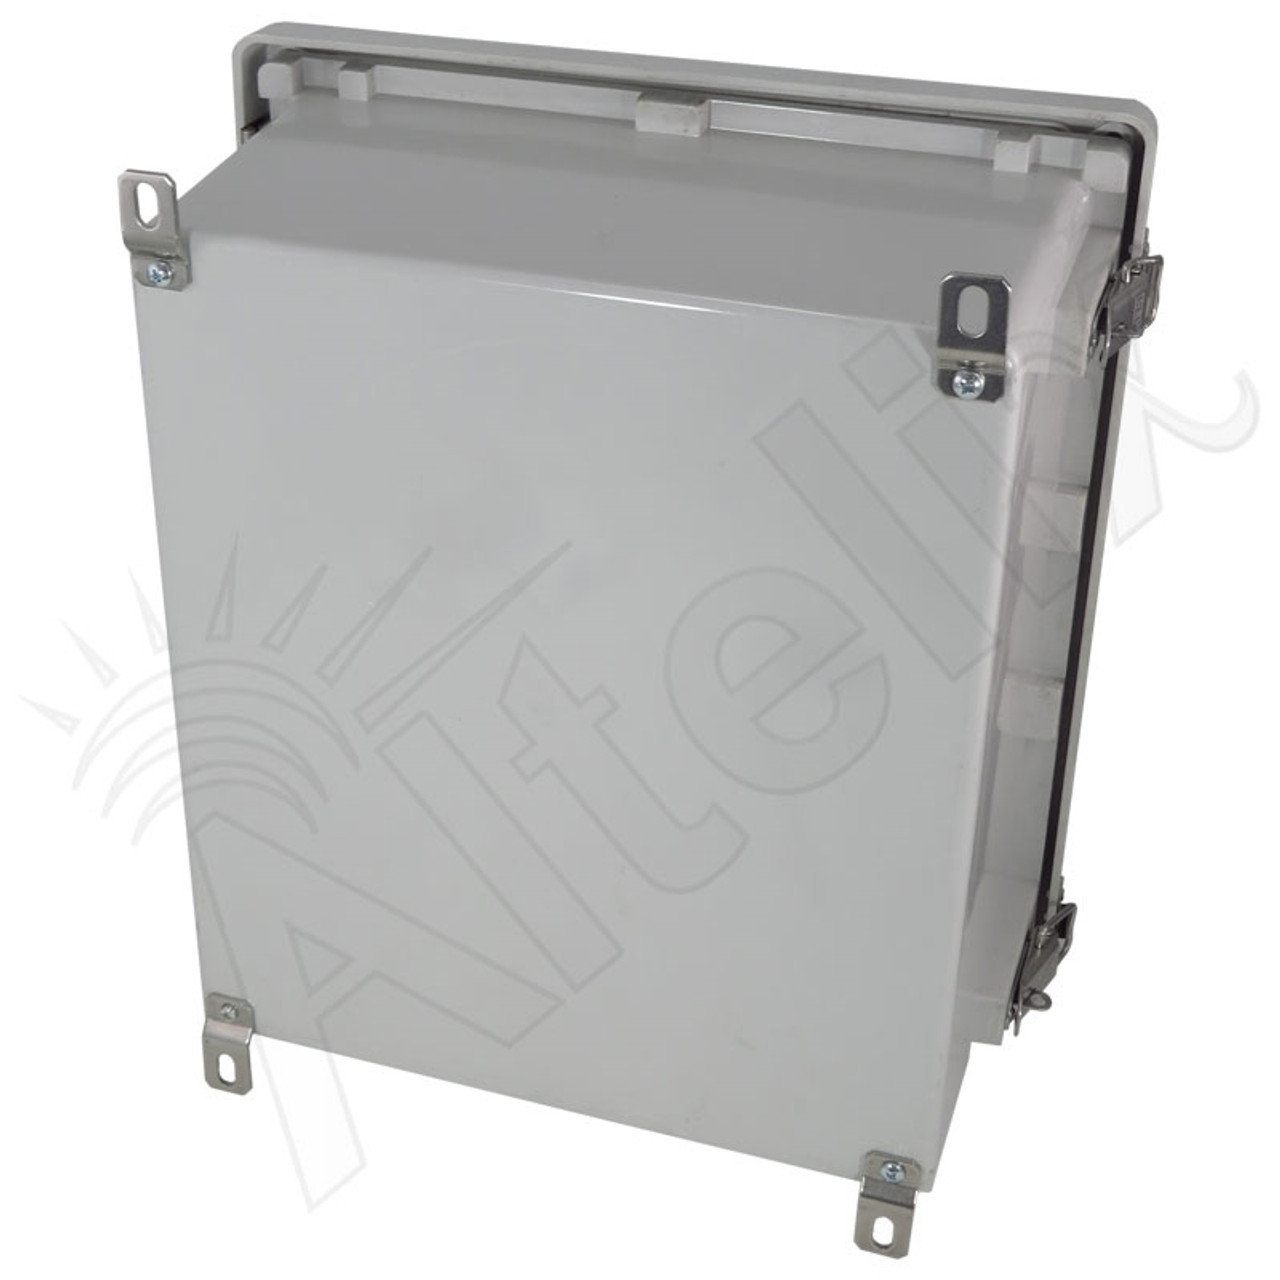 New Open Box Altelix 14x12x8 Fiberglass NEMA 4X Box Weatherproof Enclosure